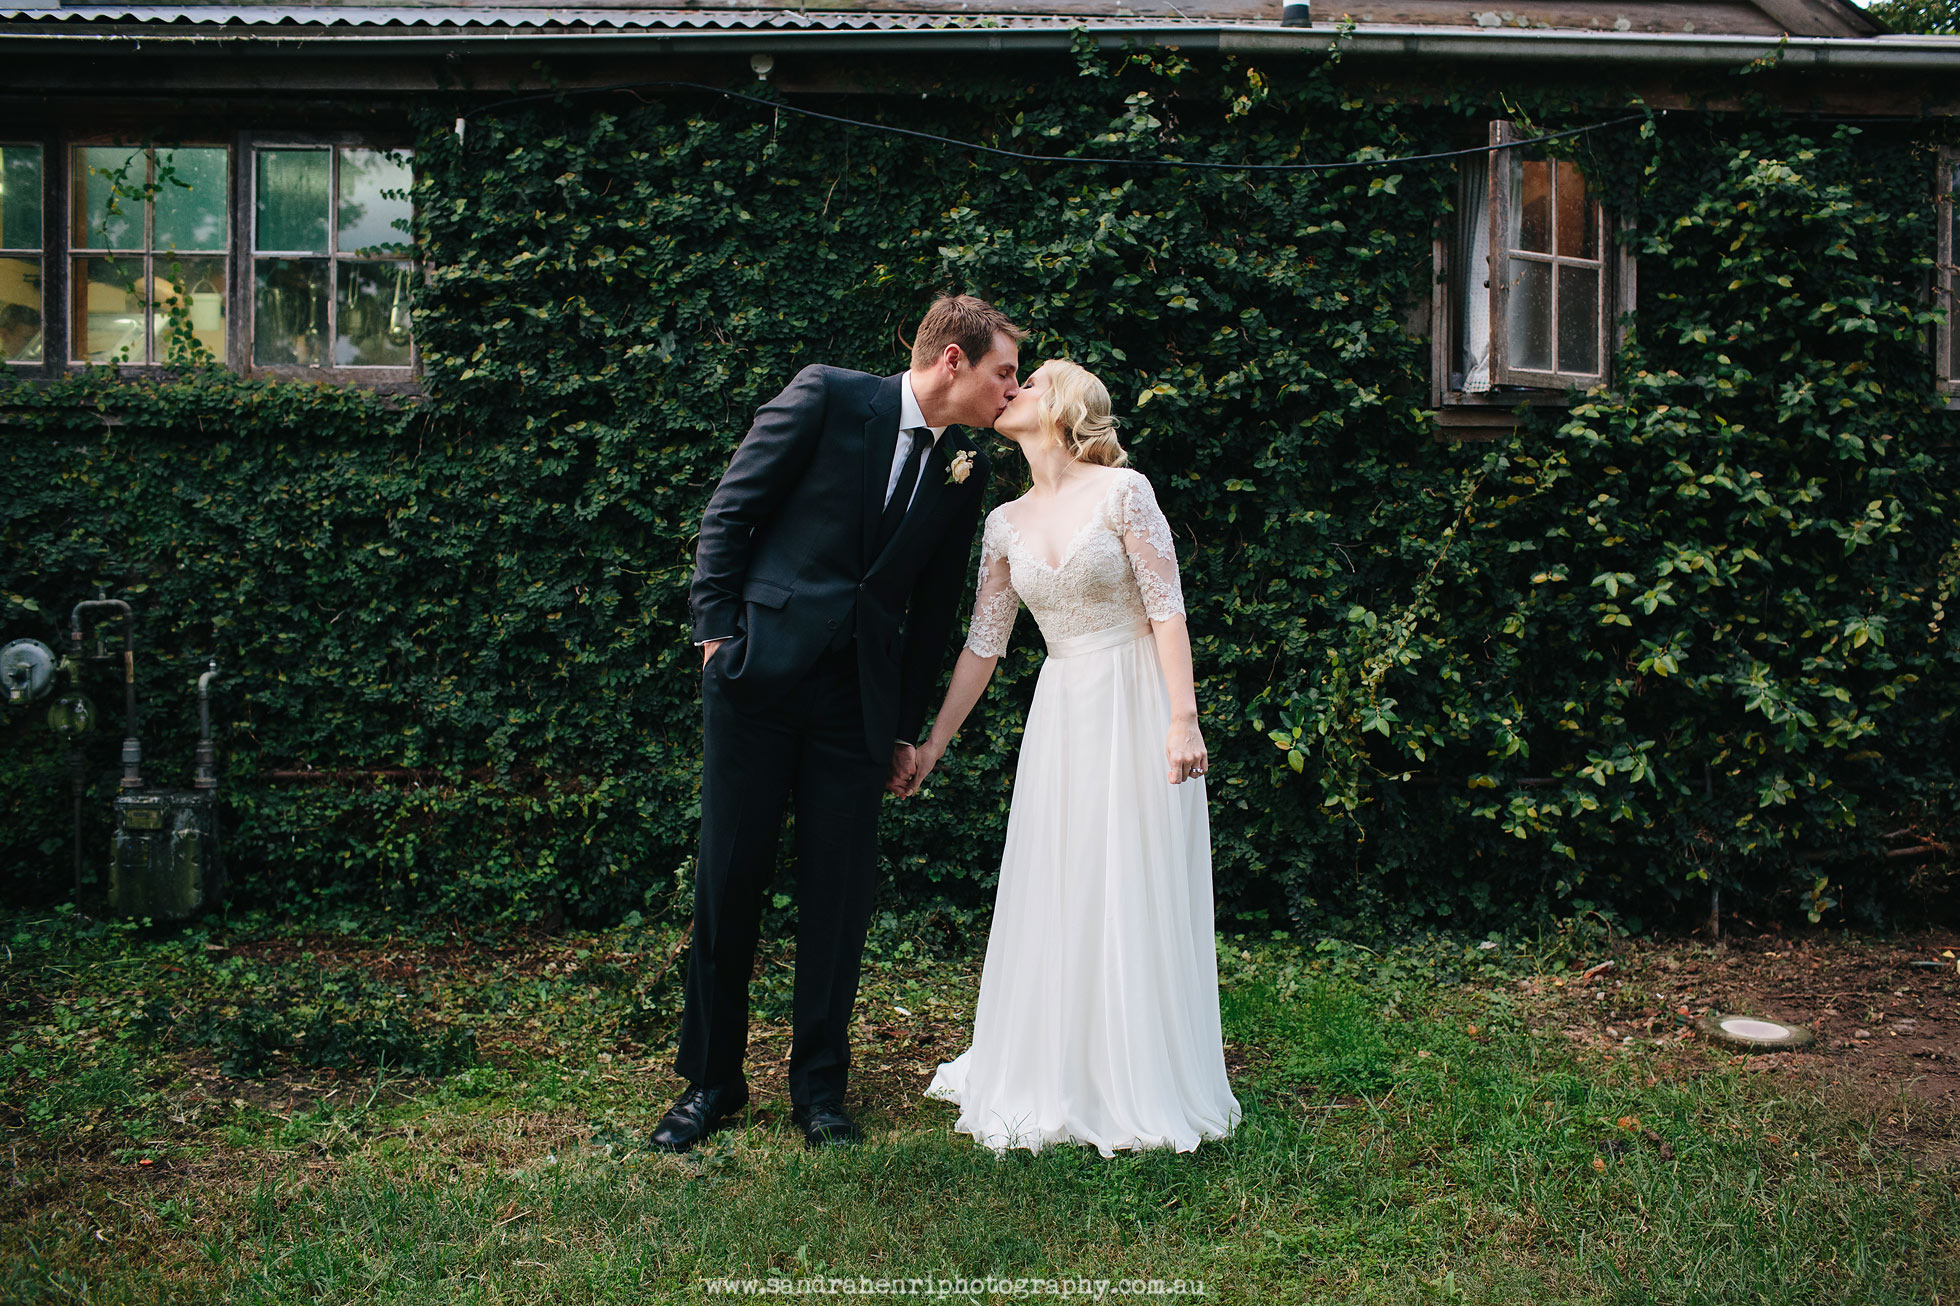 Roberts-Restaurant-garden-wedding-images-31.jpg